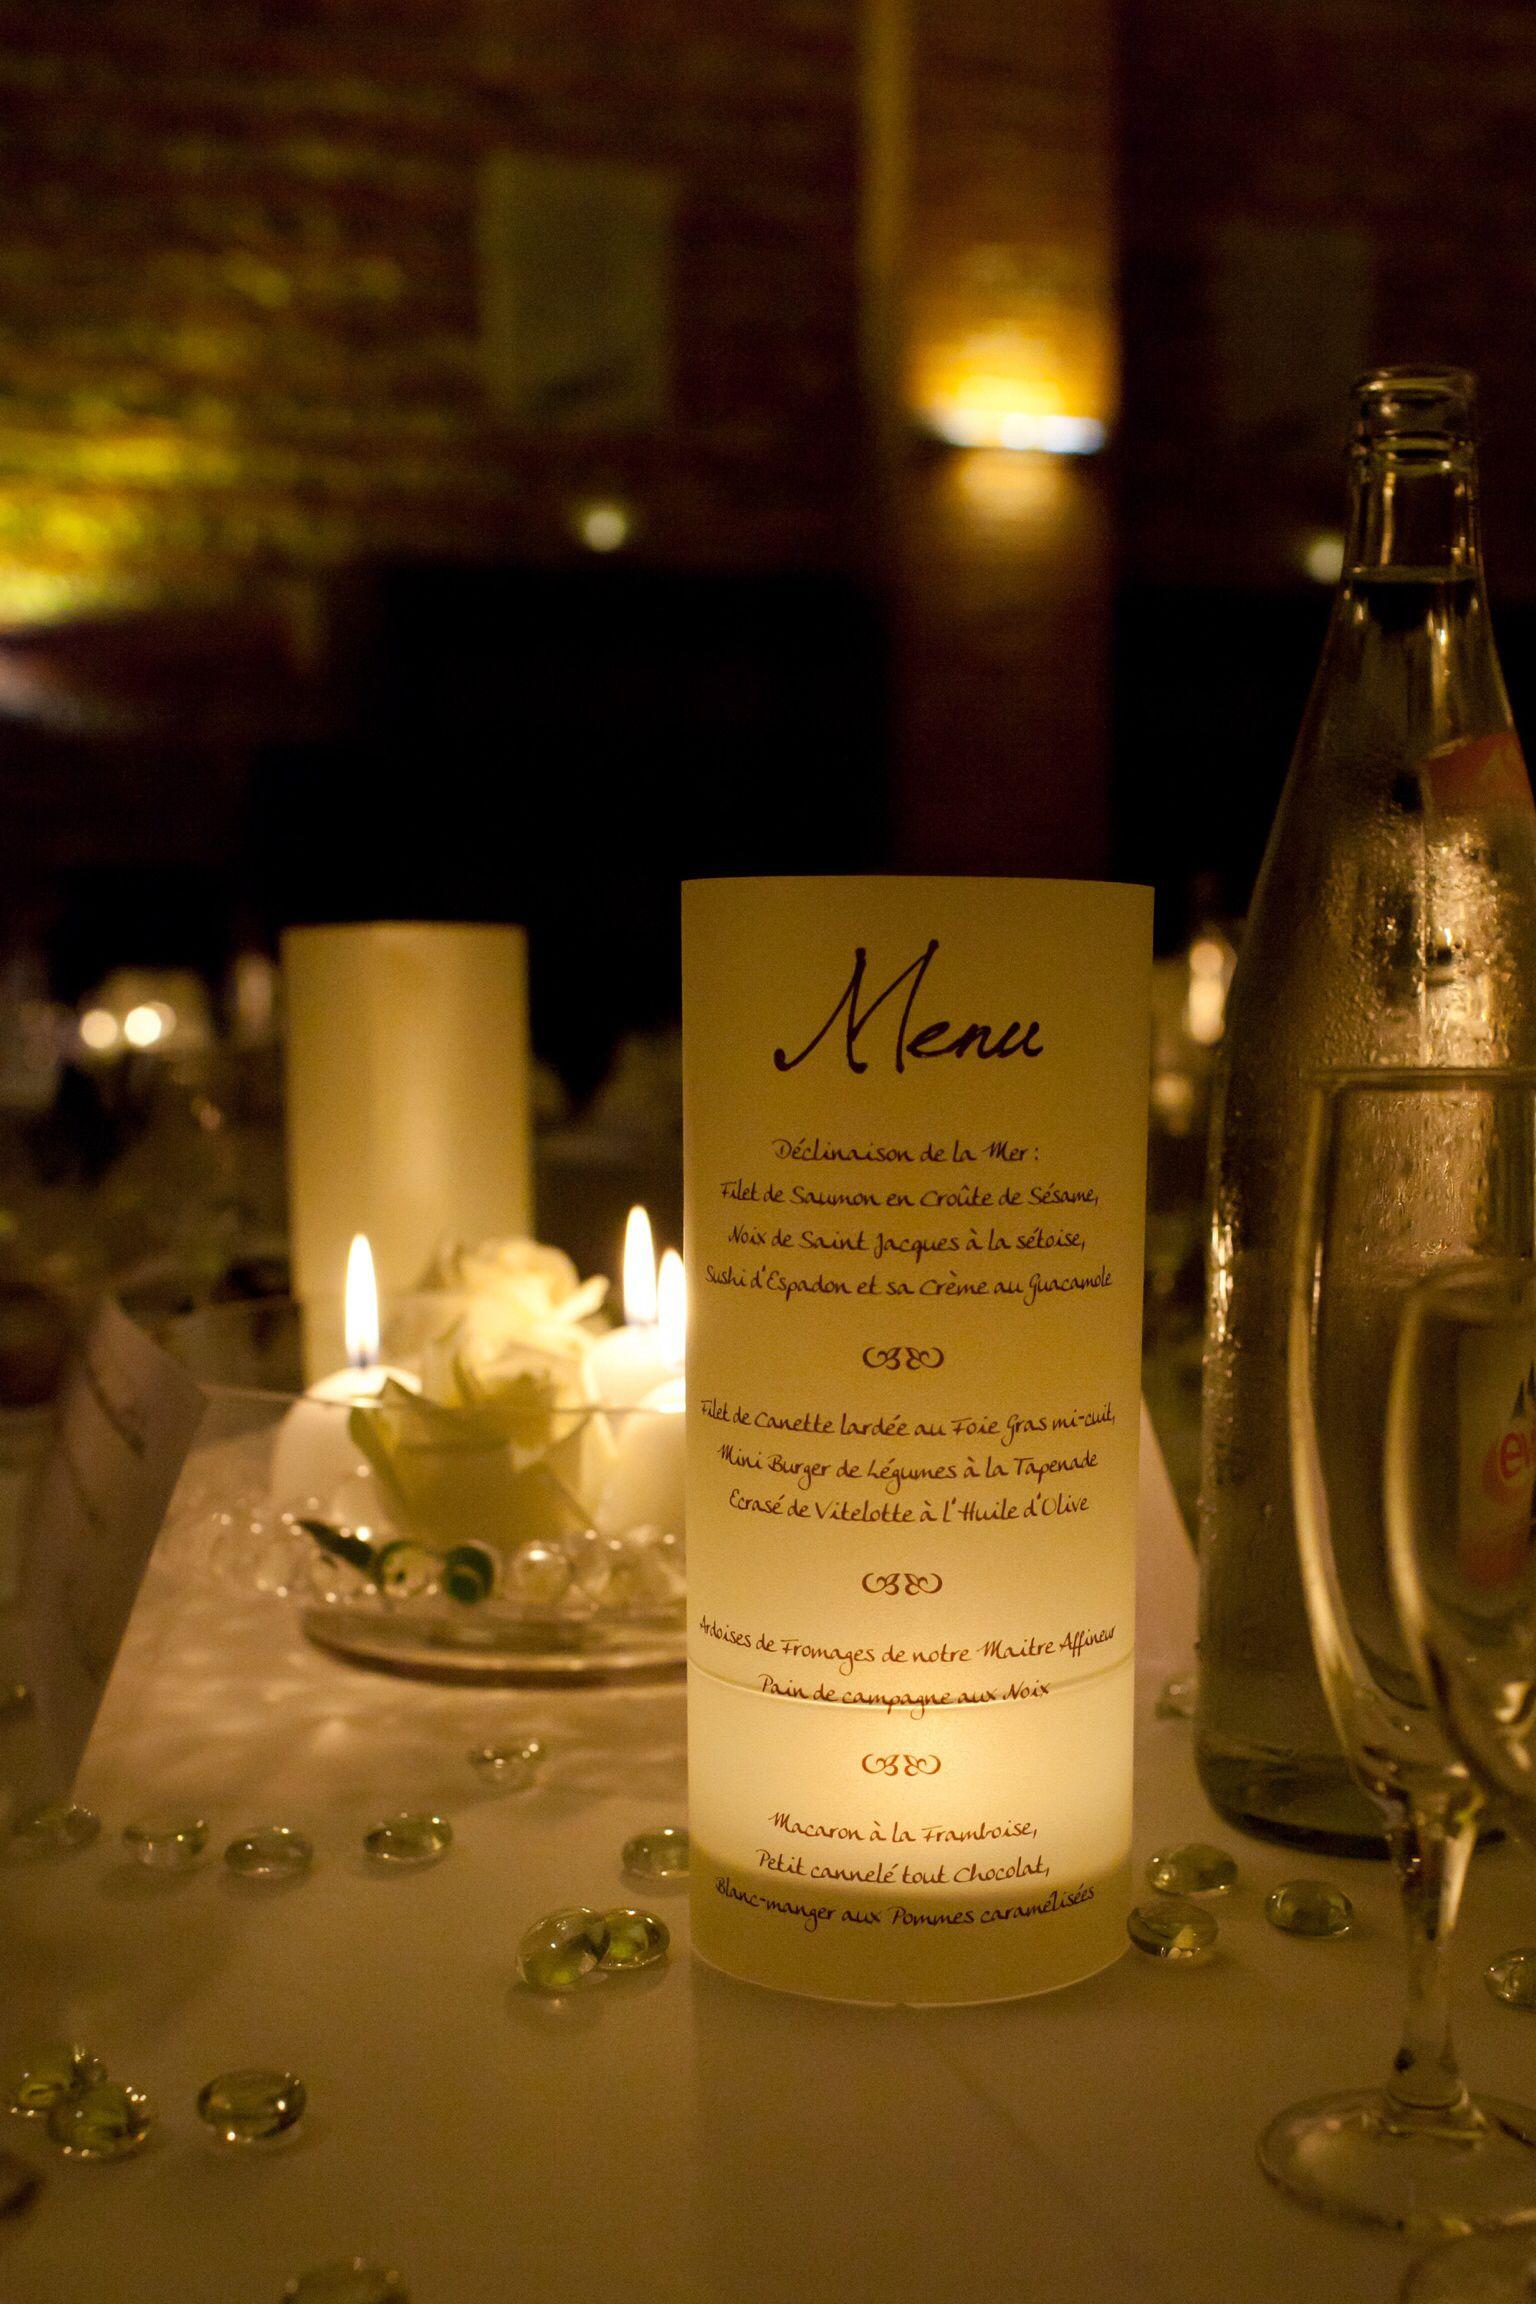 mon mariage menus photophores mariage menu mariage. Black Bedroom Furniture Sets. Home Design Ideas